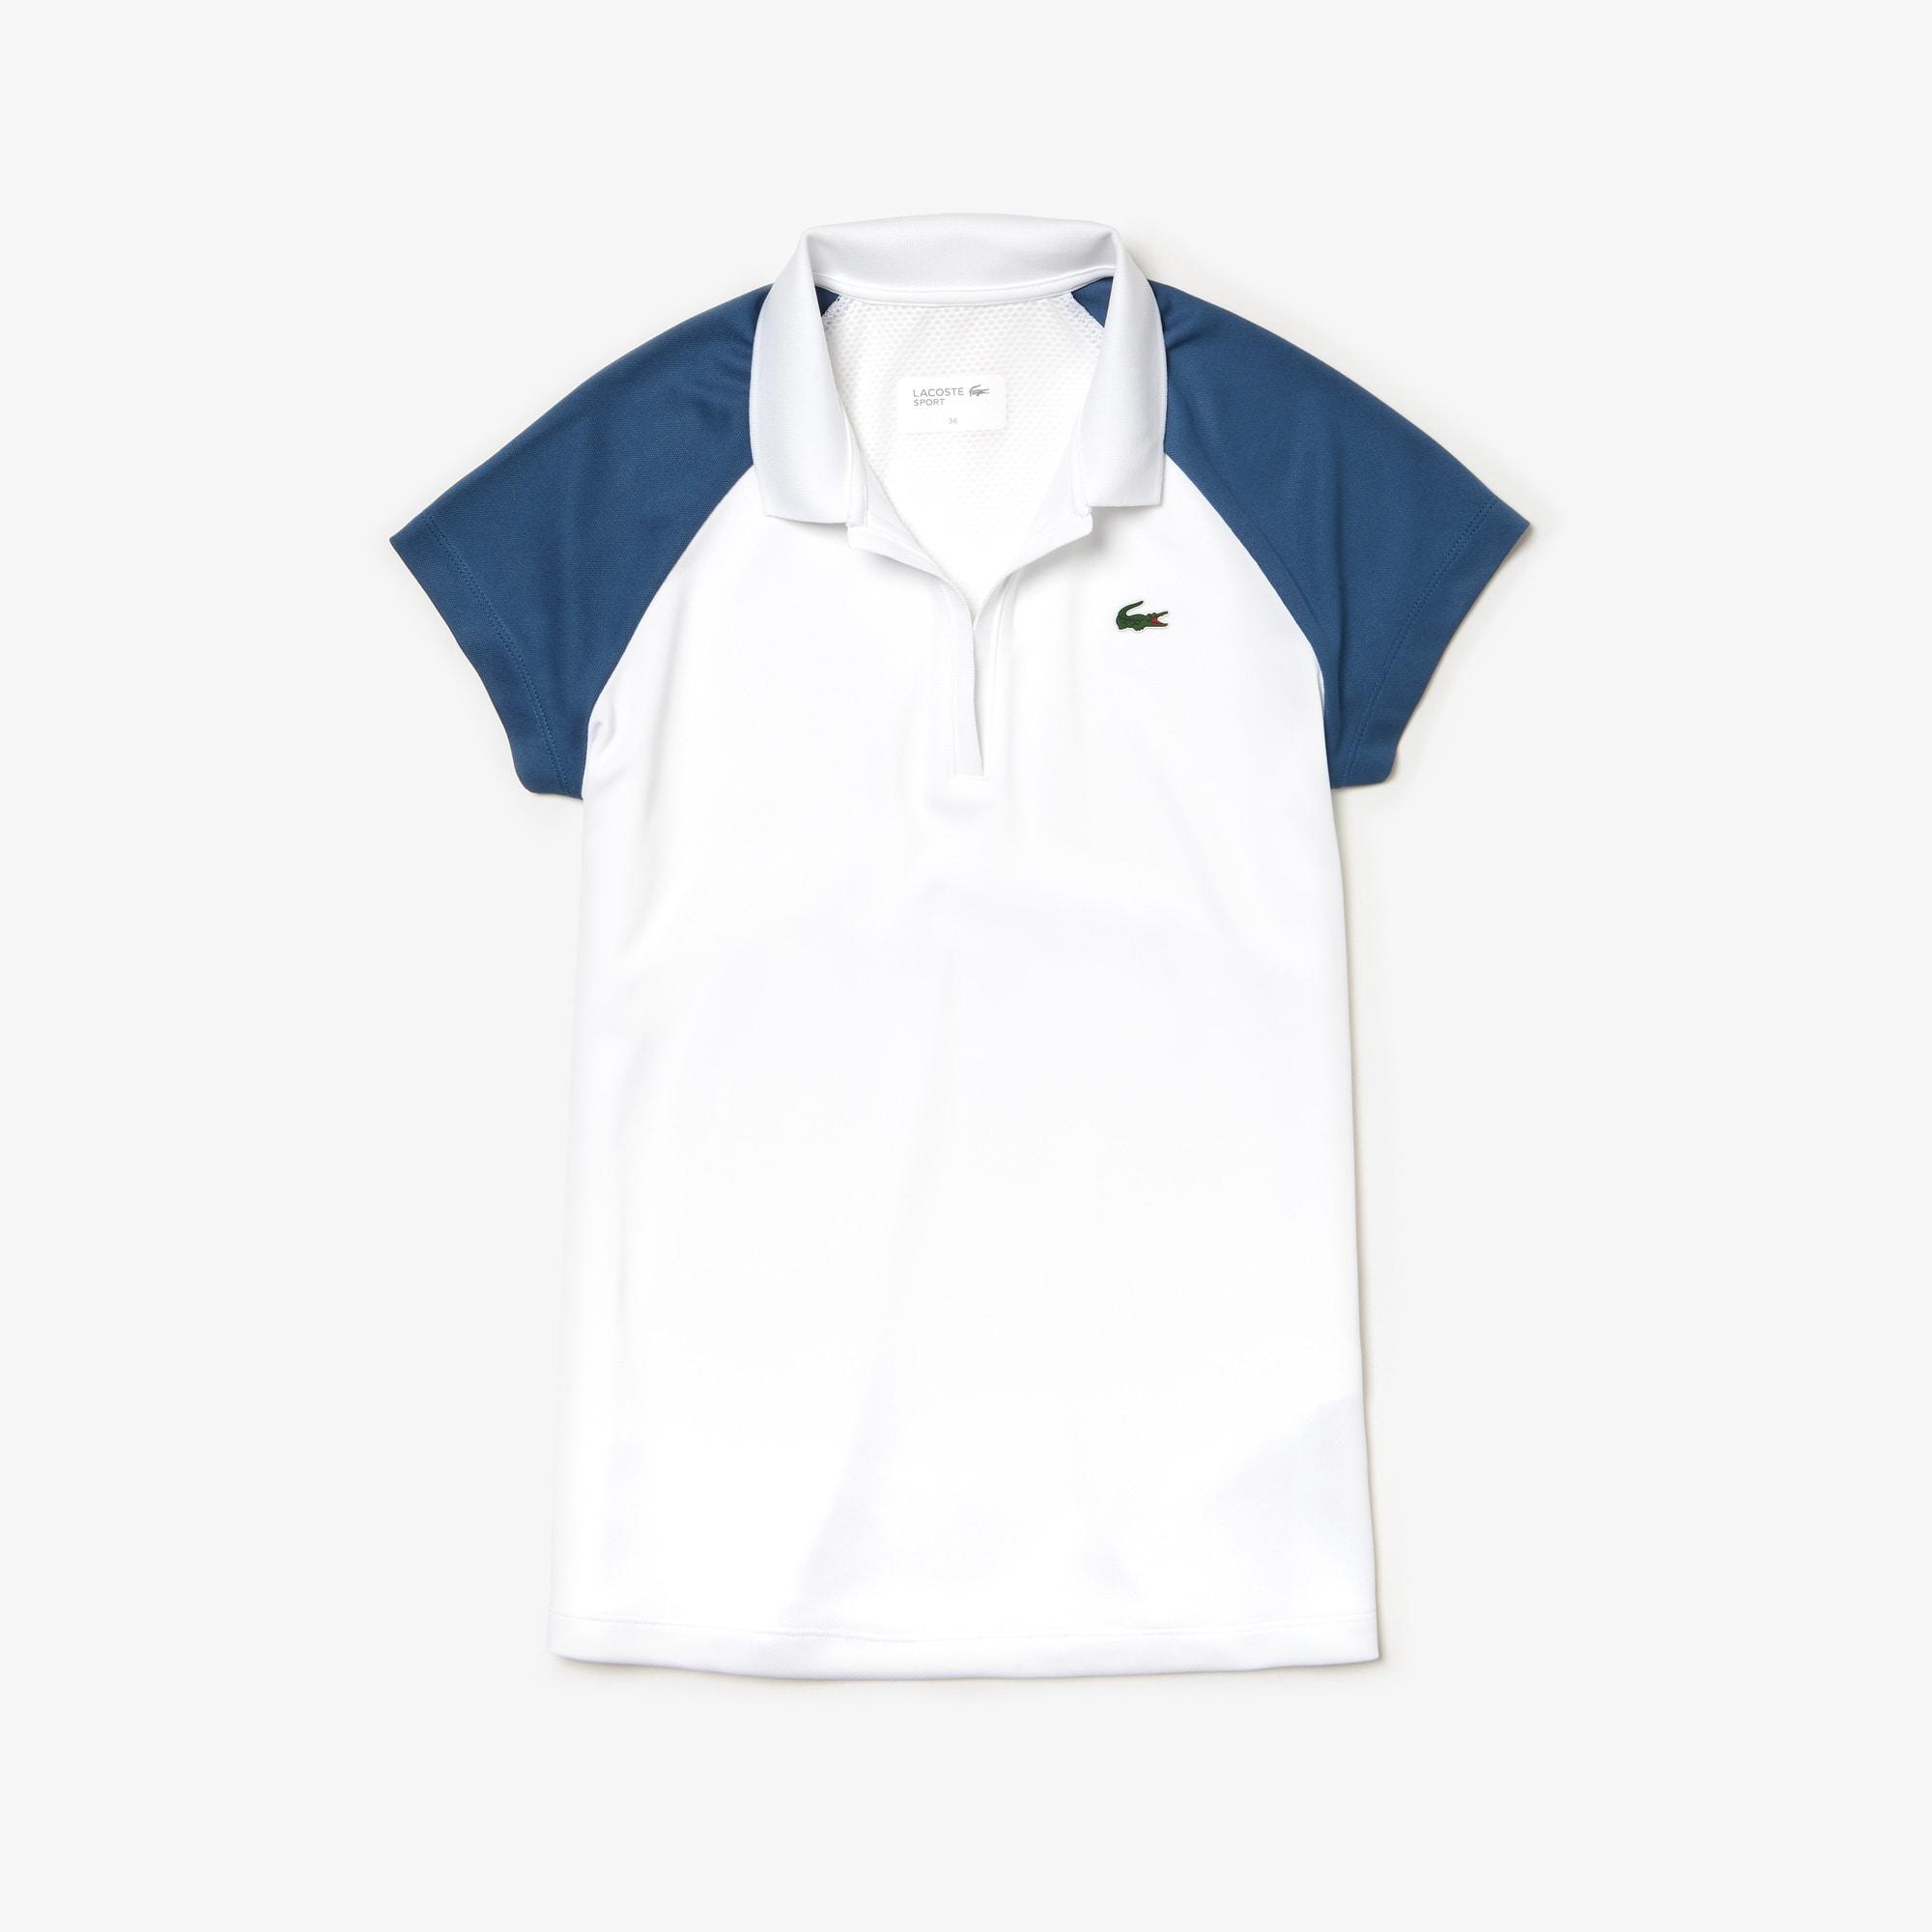 quality design 88f65 89fc7 Damen LACOSTE SPORT Tennis Poloshirt aus Funktionspiqué und Mesh